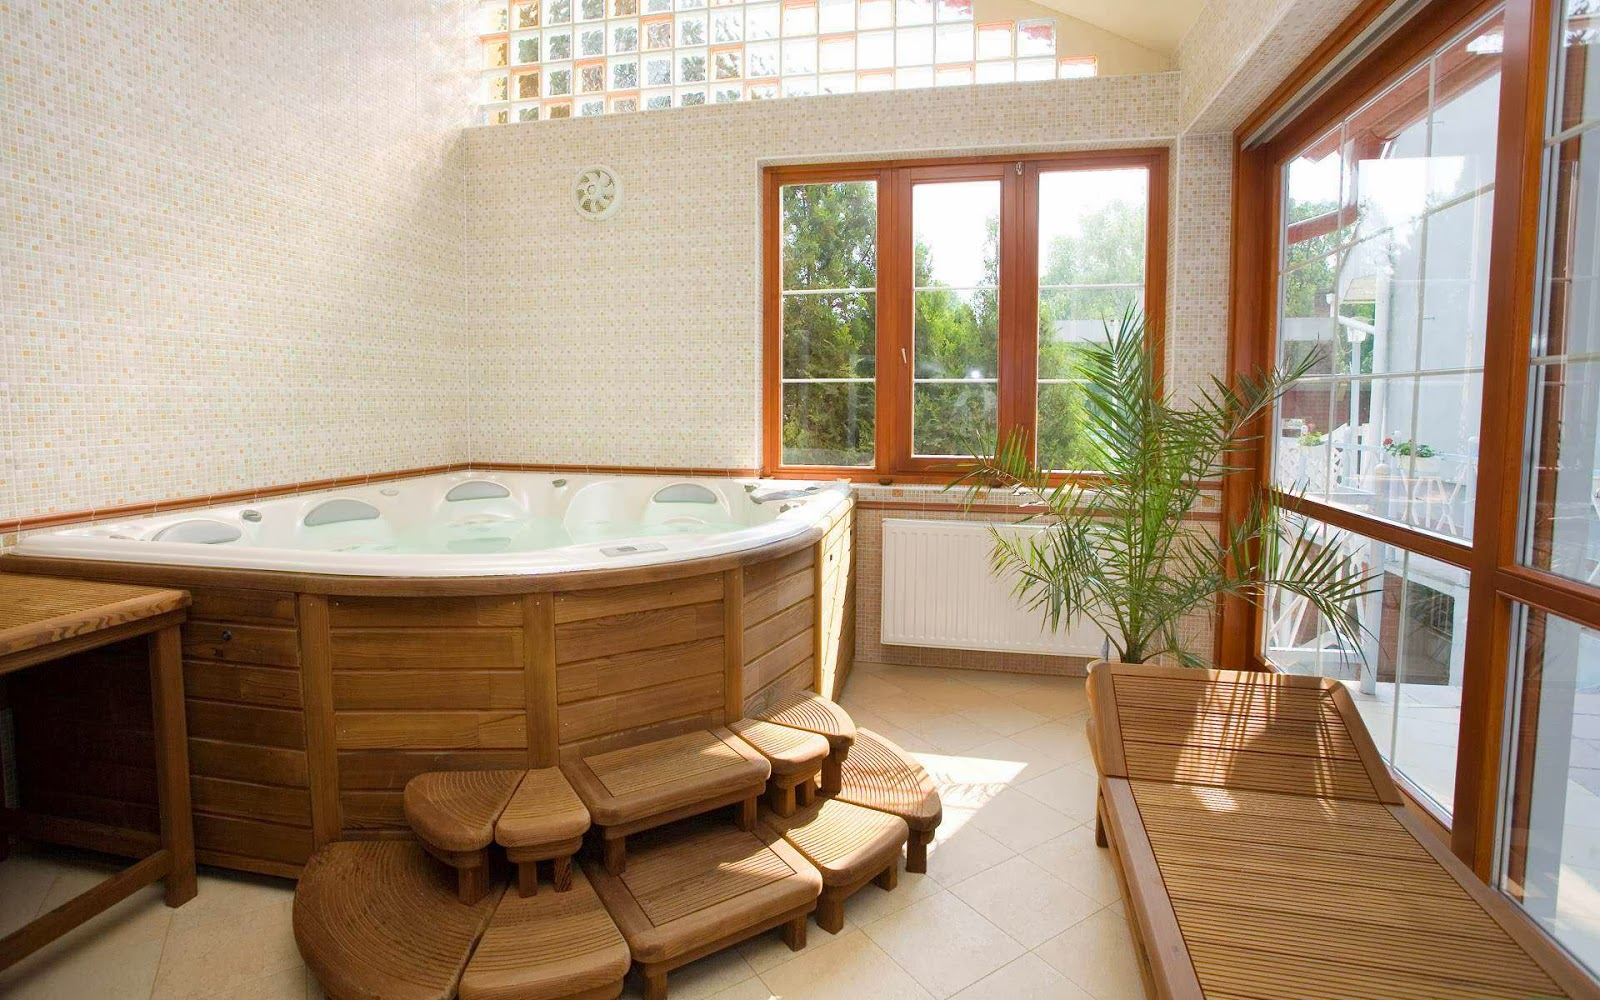 Modern Living Room Interior Designs 2014 - Home Decoration Ideas